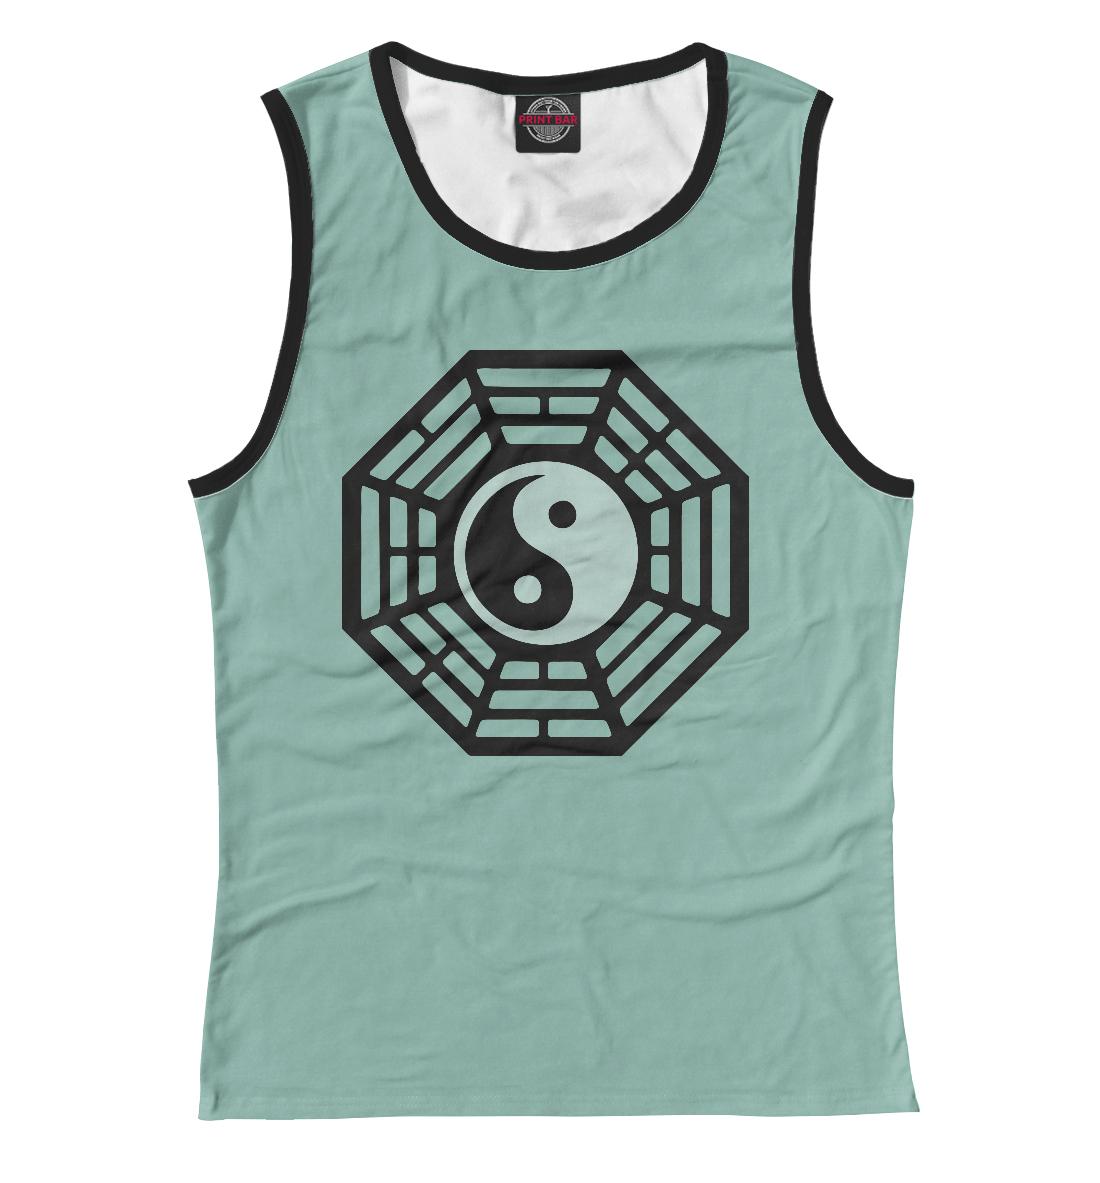 Купить Lost - Dharma Initiative (Blue), Printbar, Майки, APD-420461-may-1